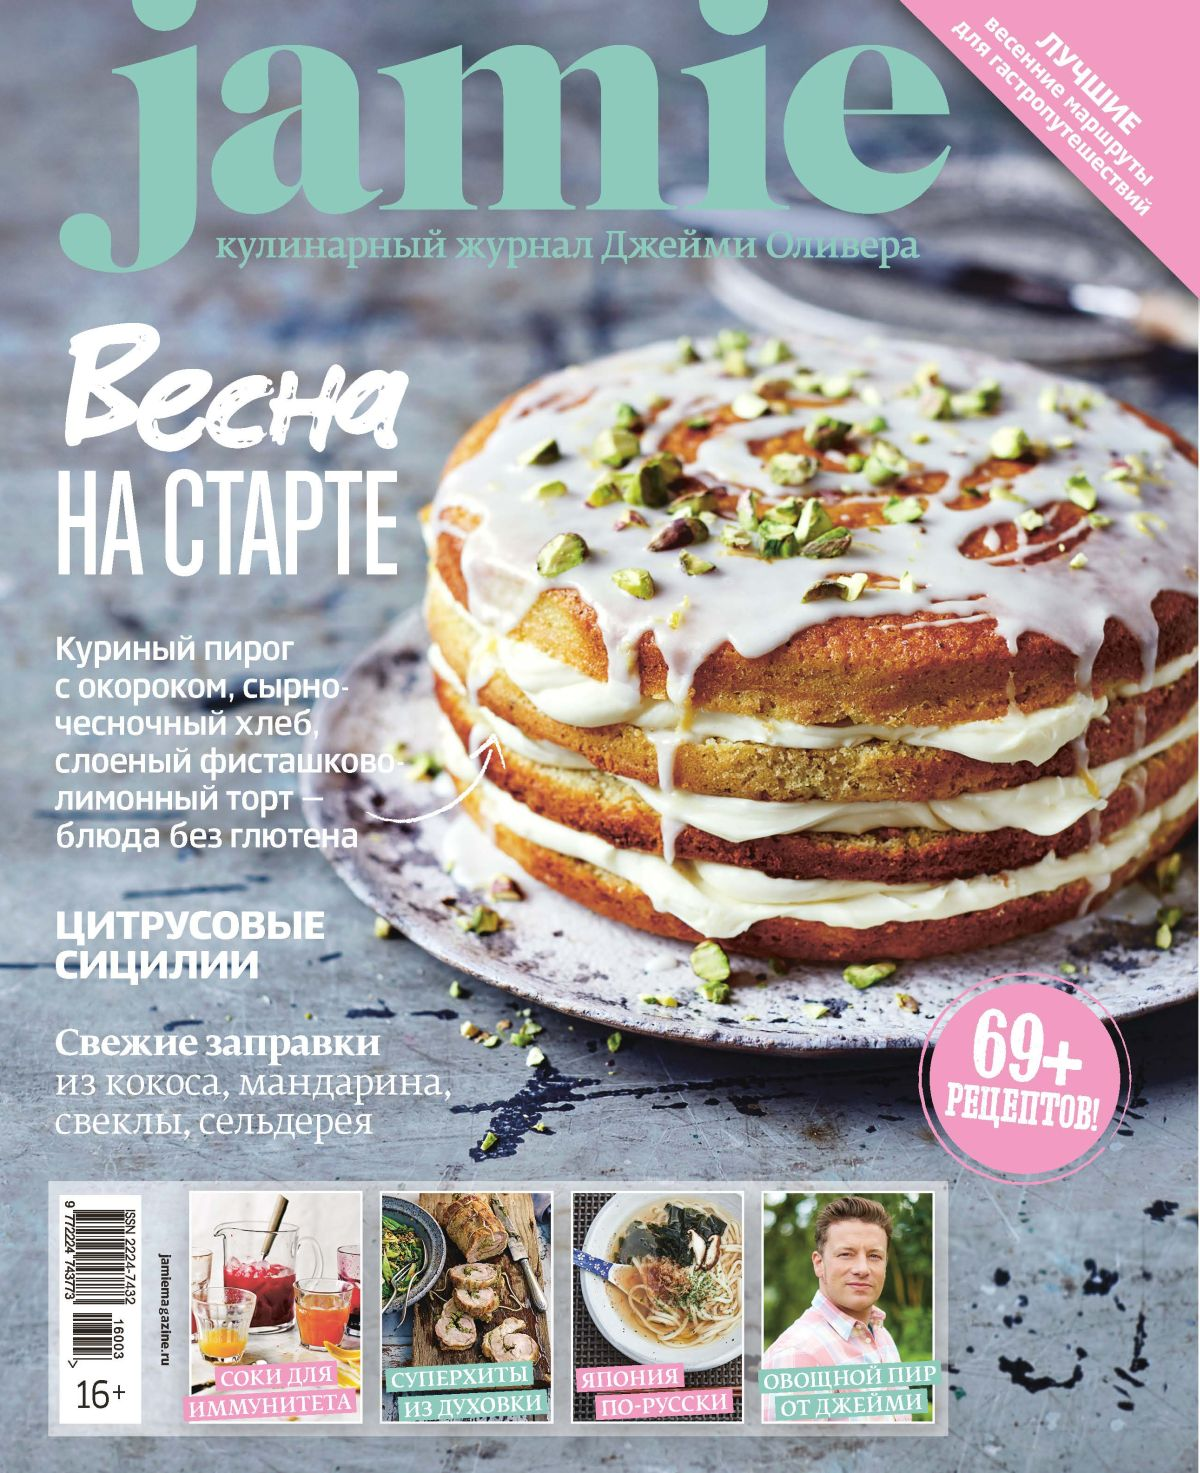 Журнал Jamie Magazine №3-4 март-апрель 2016 г. кольца